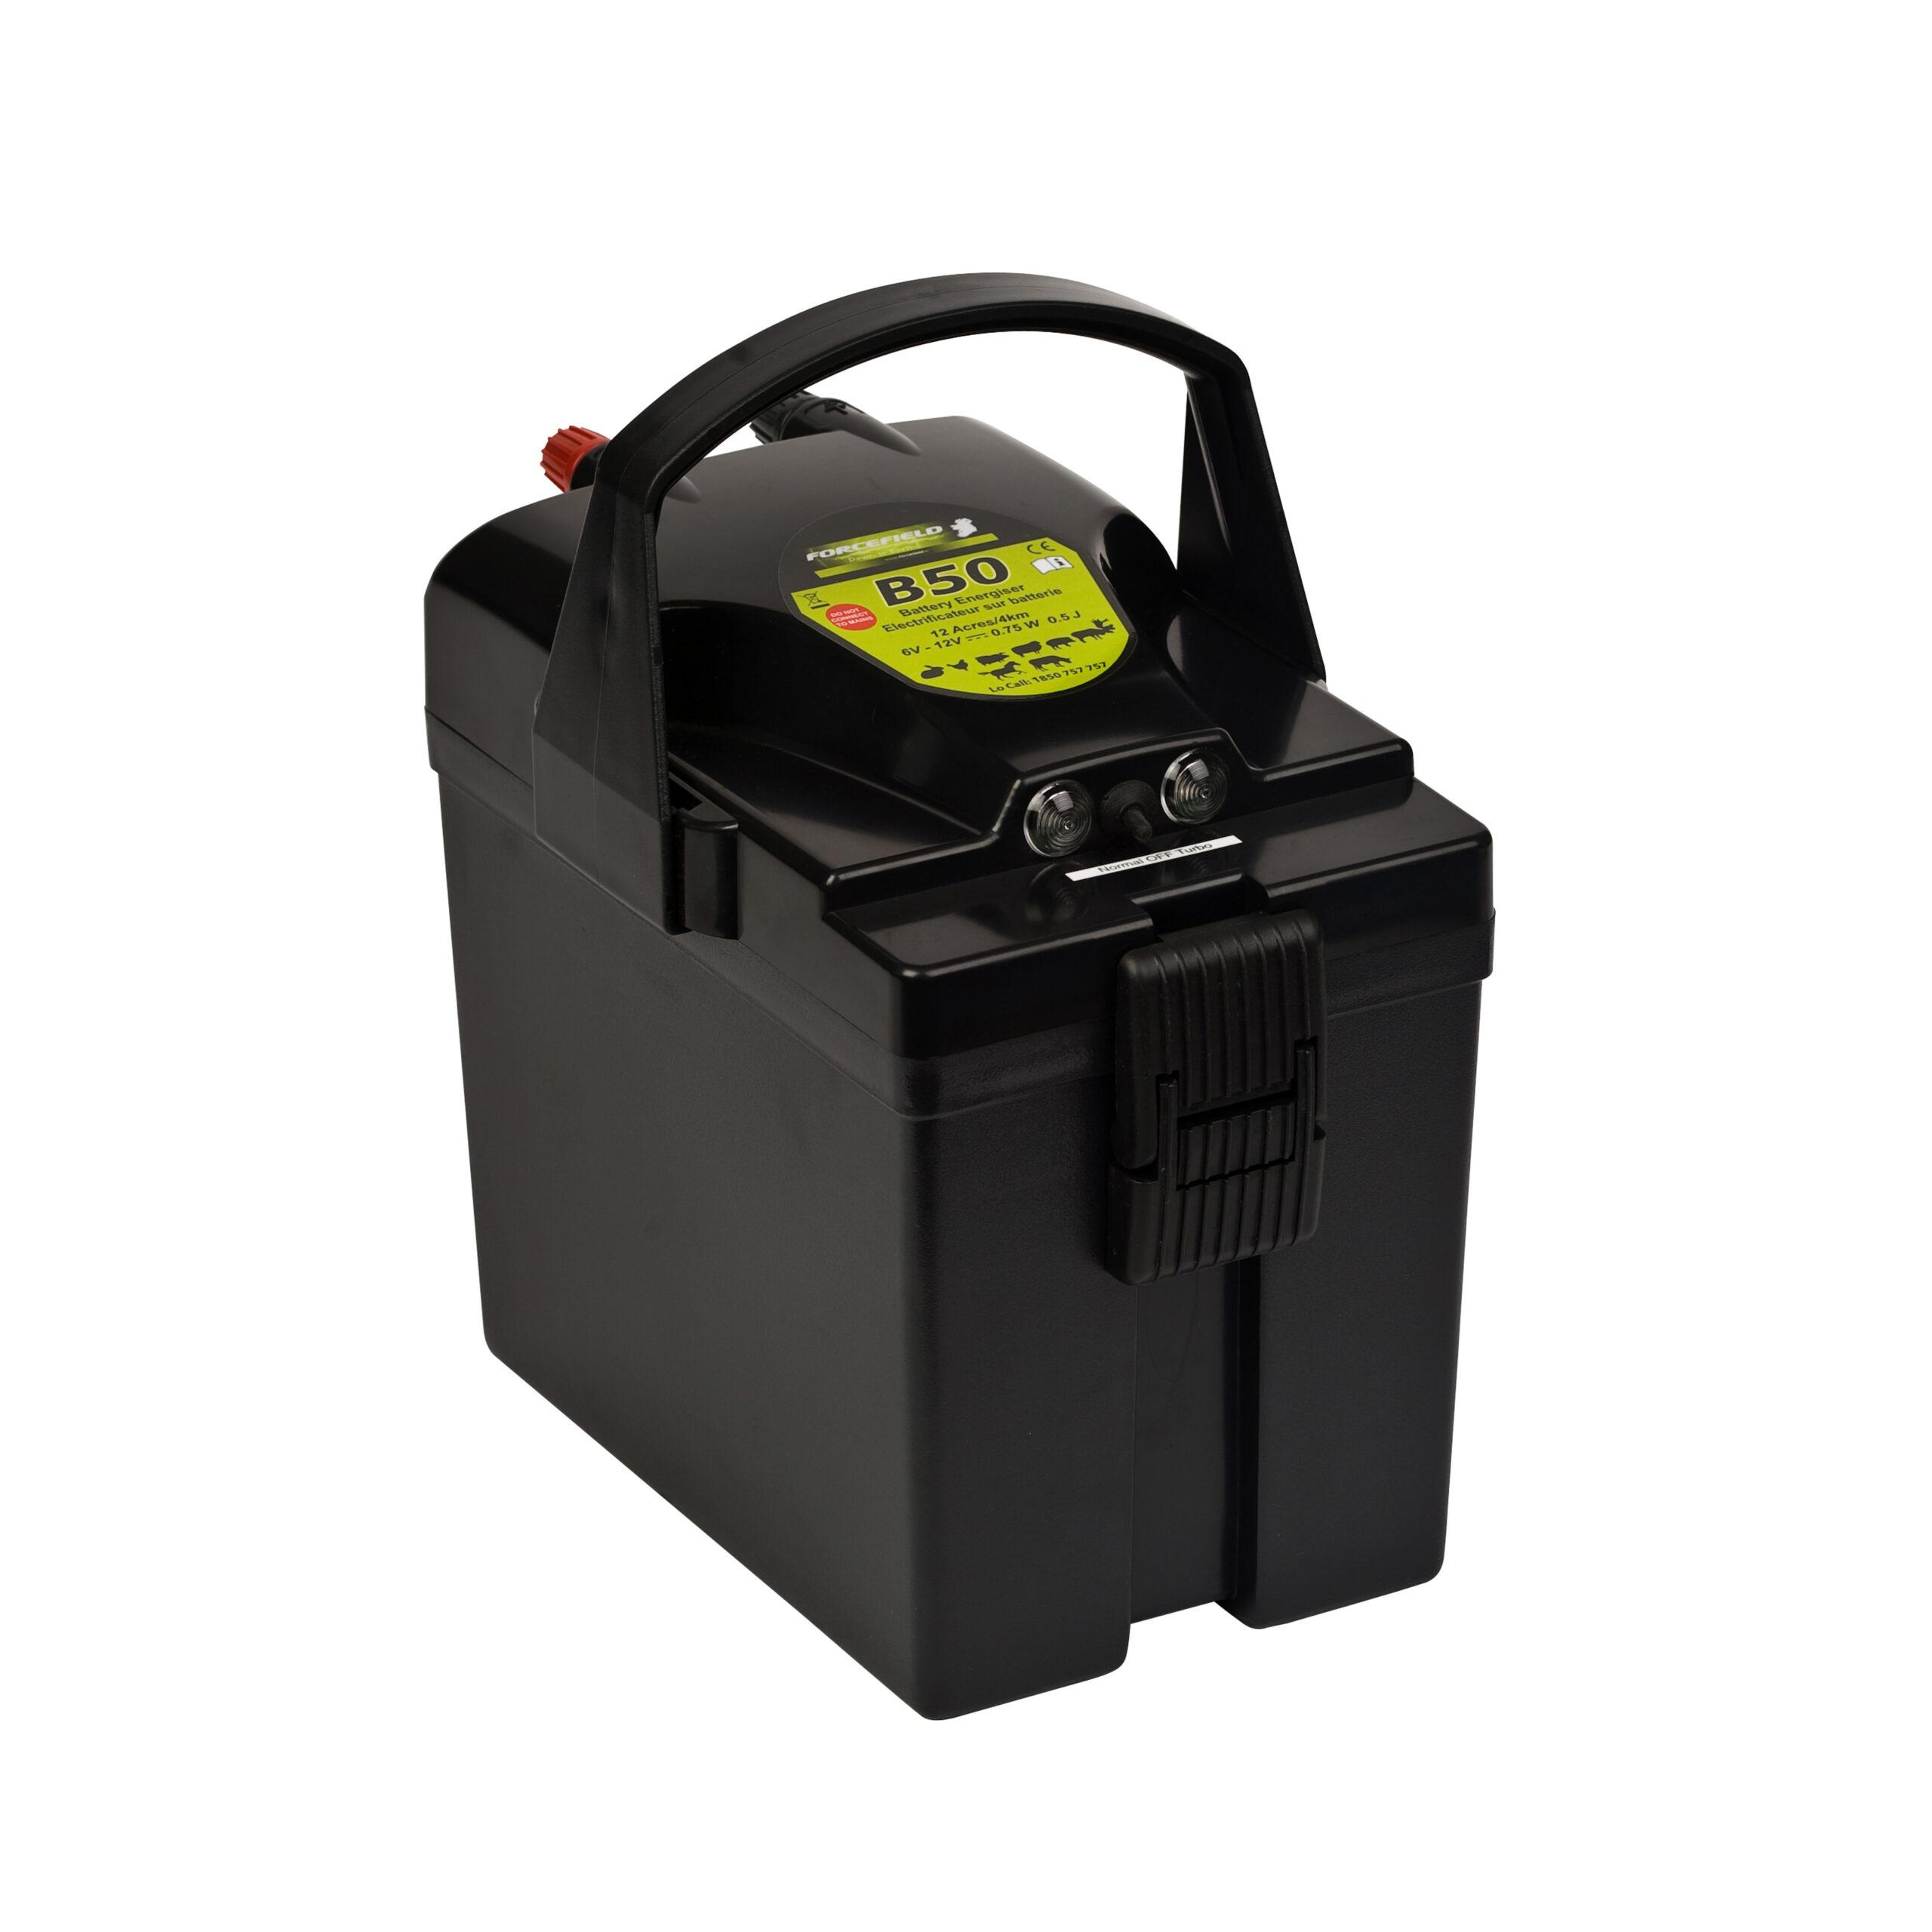 B50 Battery Energiser Promo with Battery